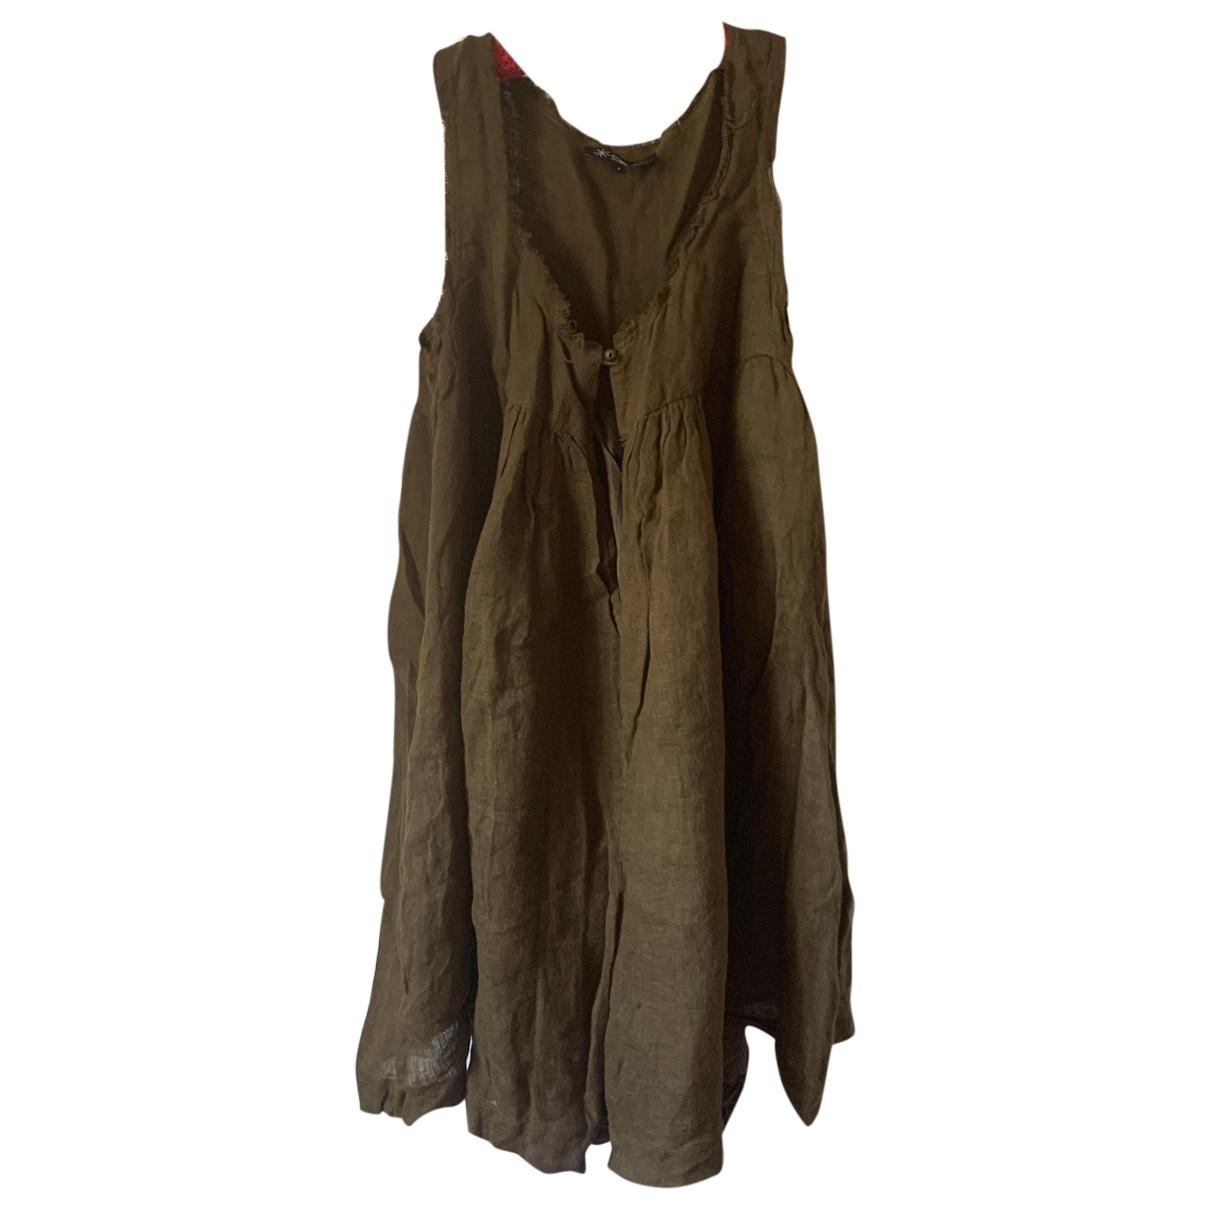 Isabel Marant Etoile \N Khaki Linen jumpsuit for Women 1 US